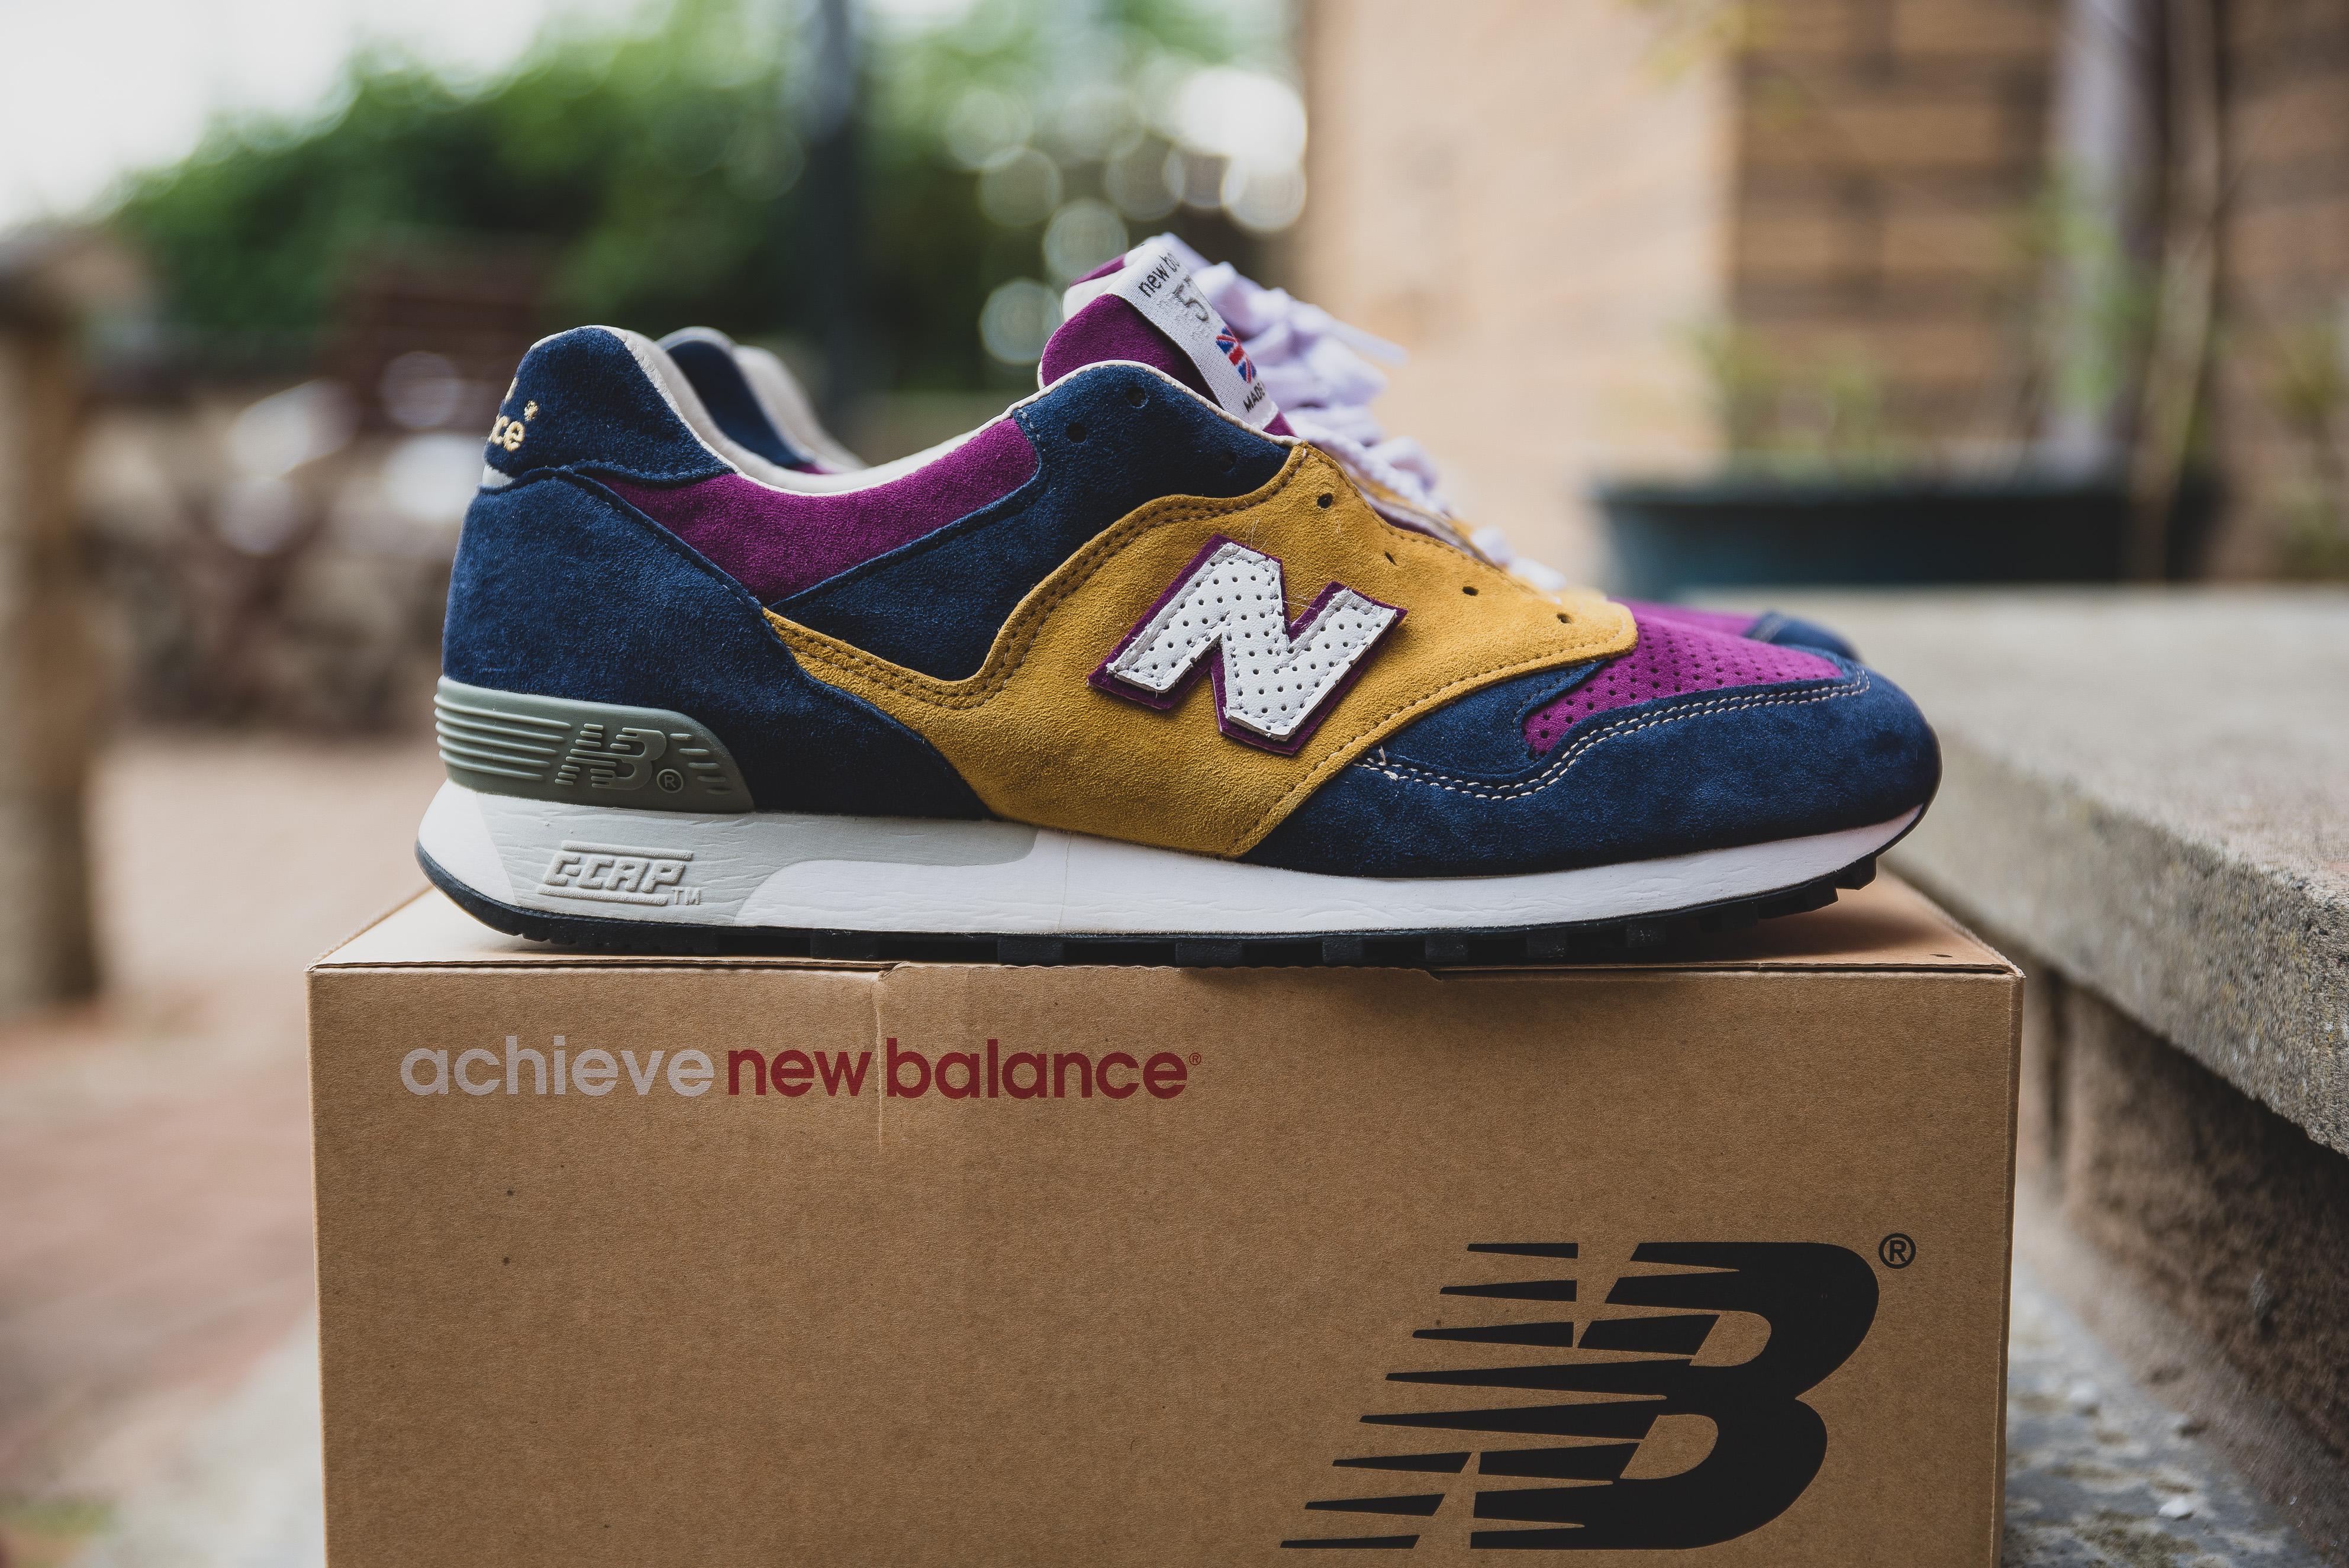 New Balance x hanon shop samples – thomaslindie 6eb580e096